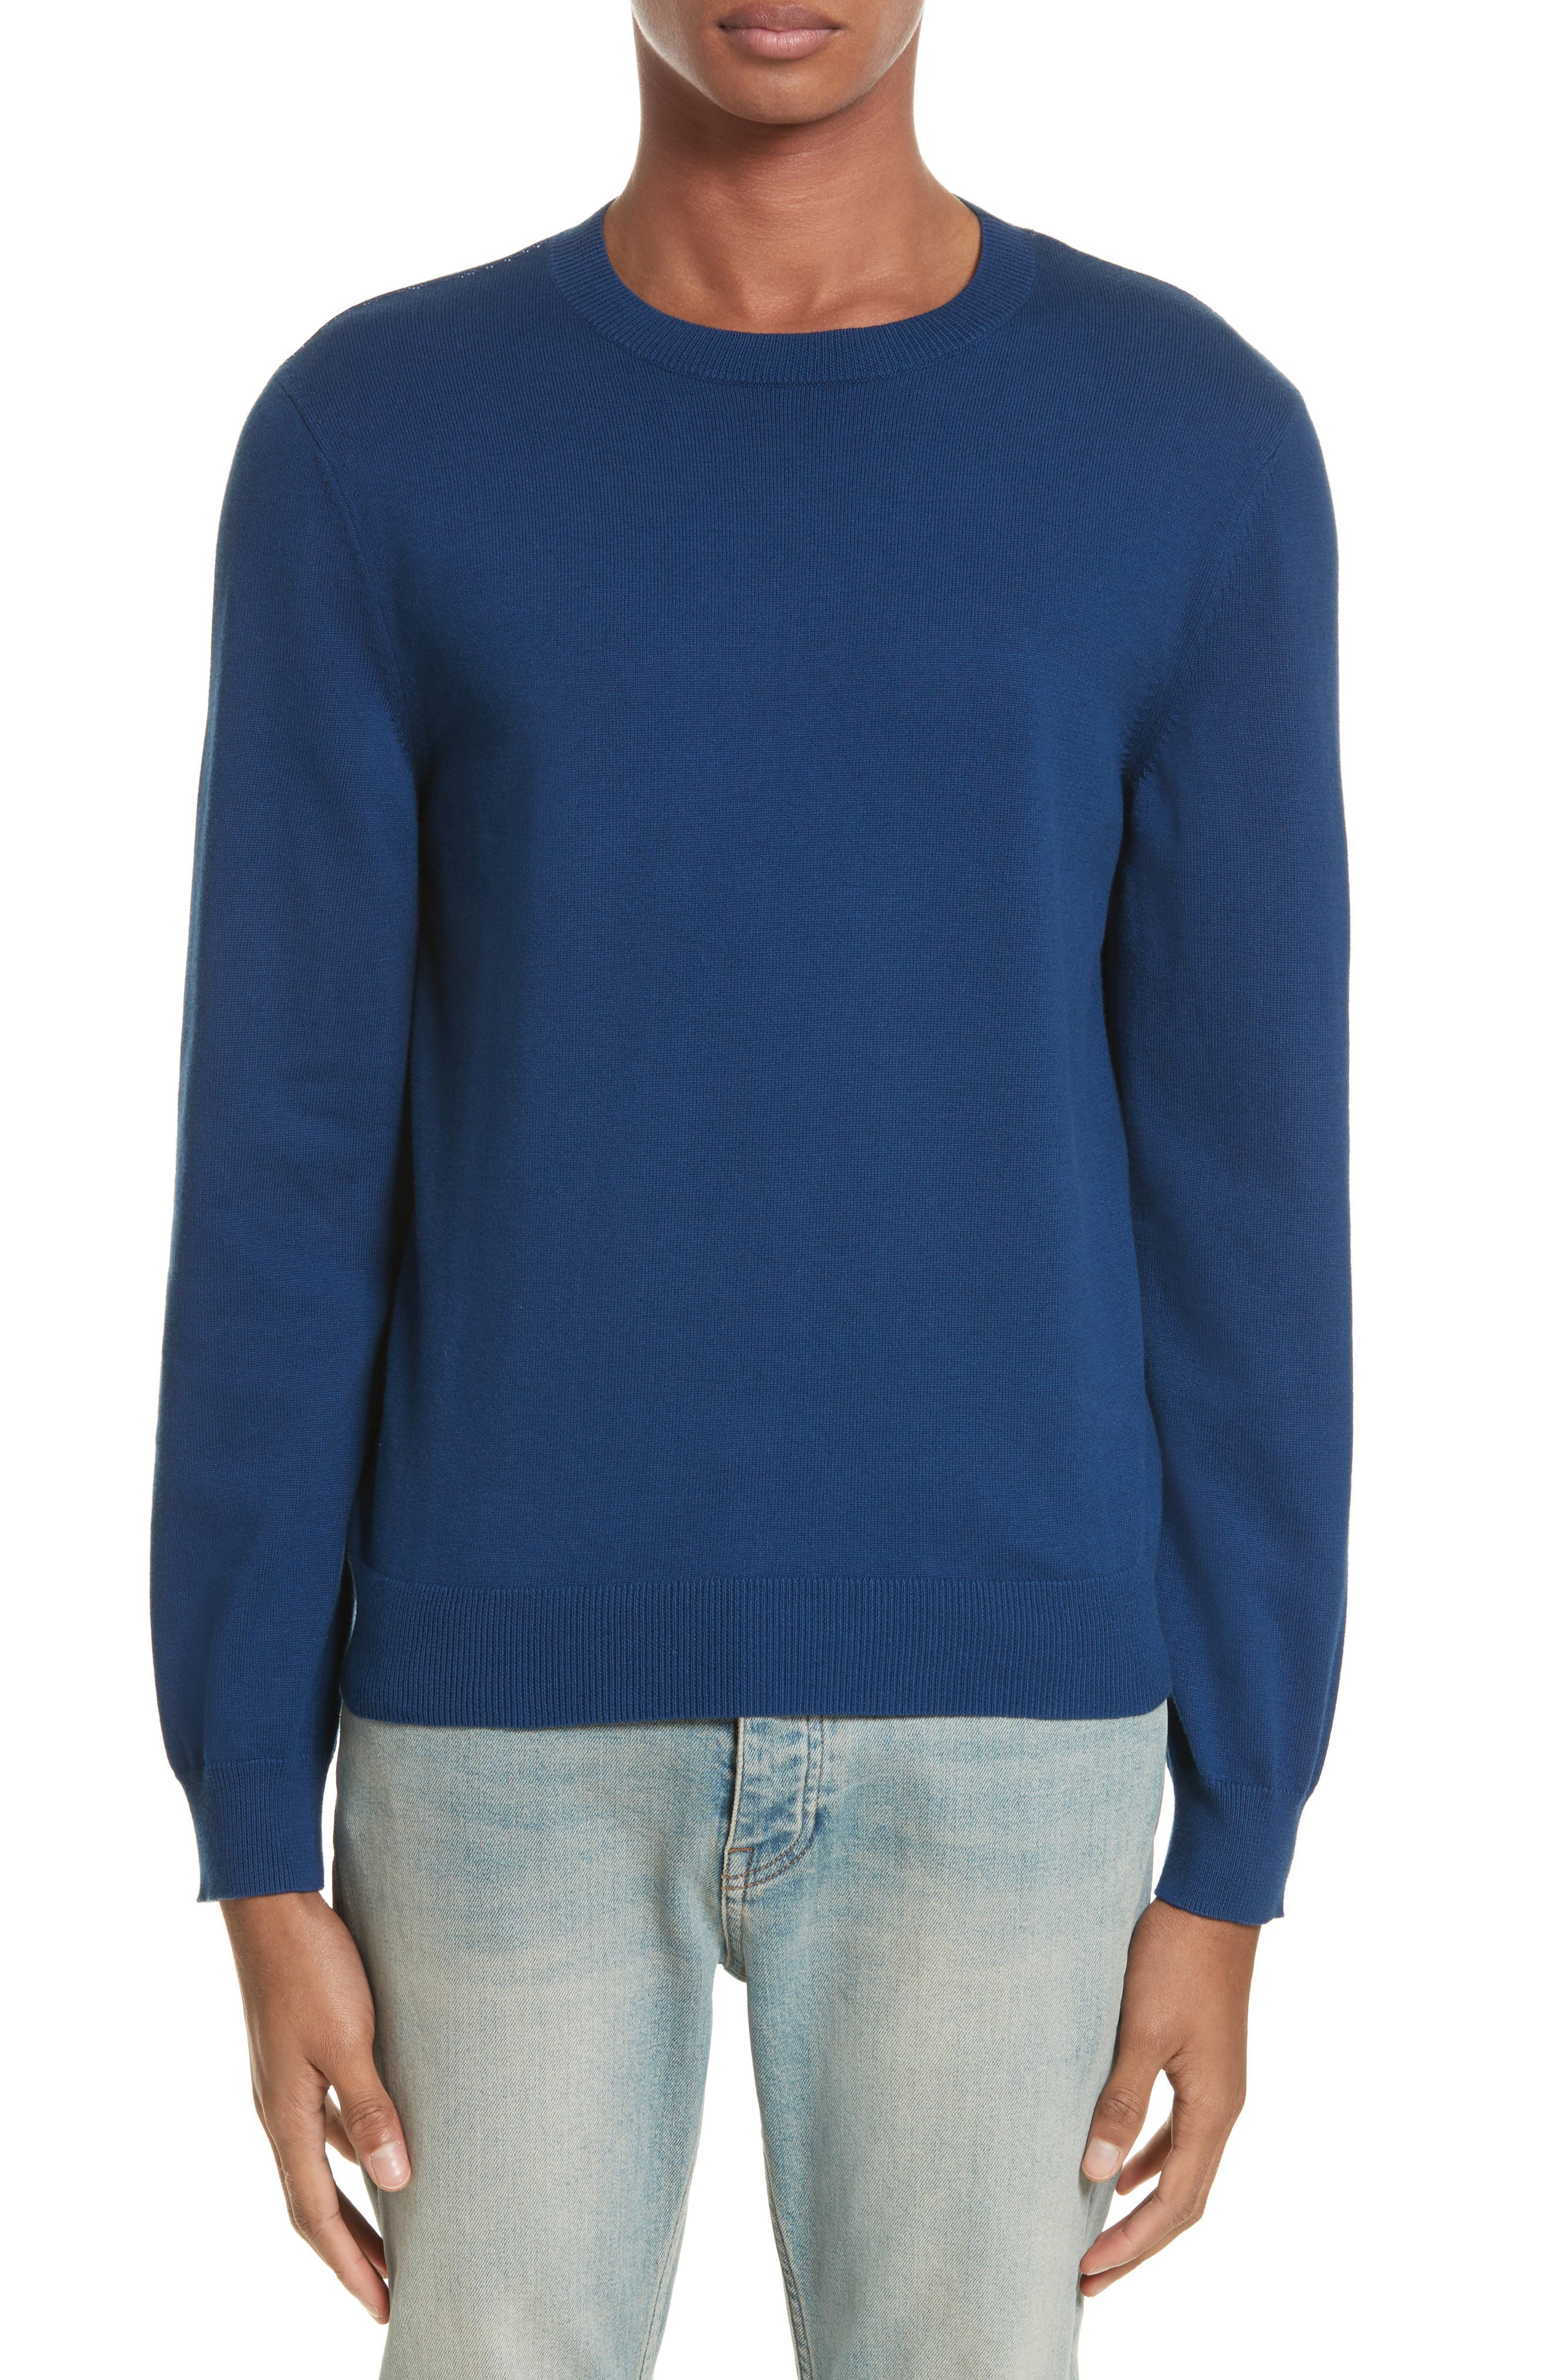 Alternate Image 1 Selected - A.P.C. CIA Crewneck Sweater